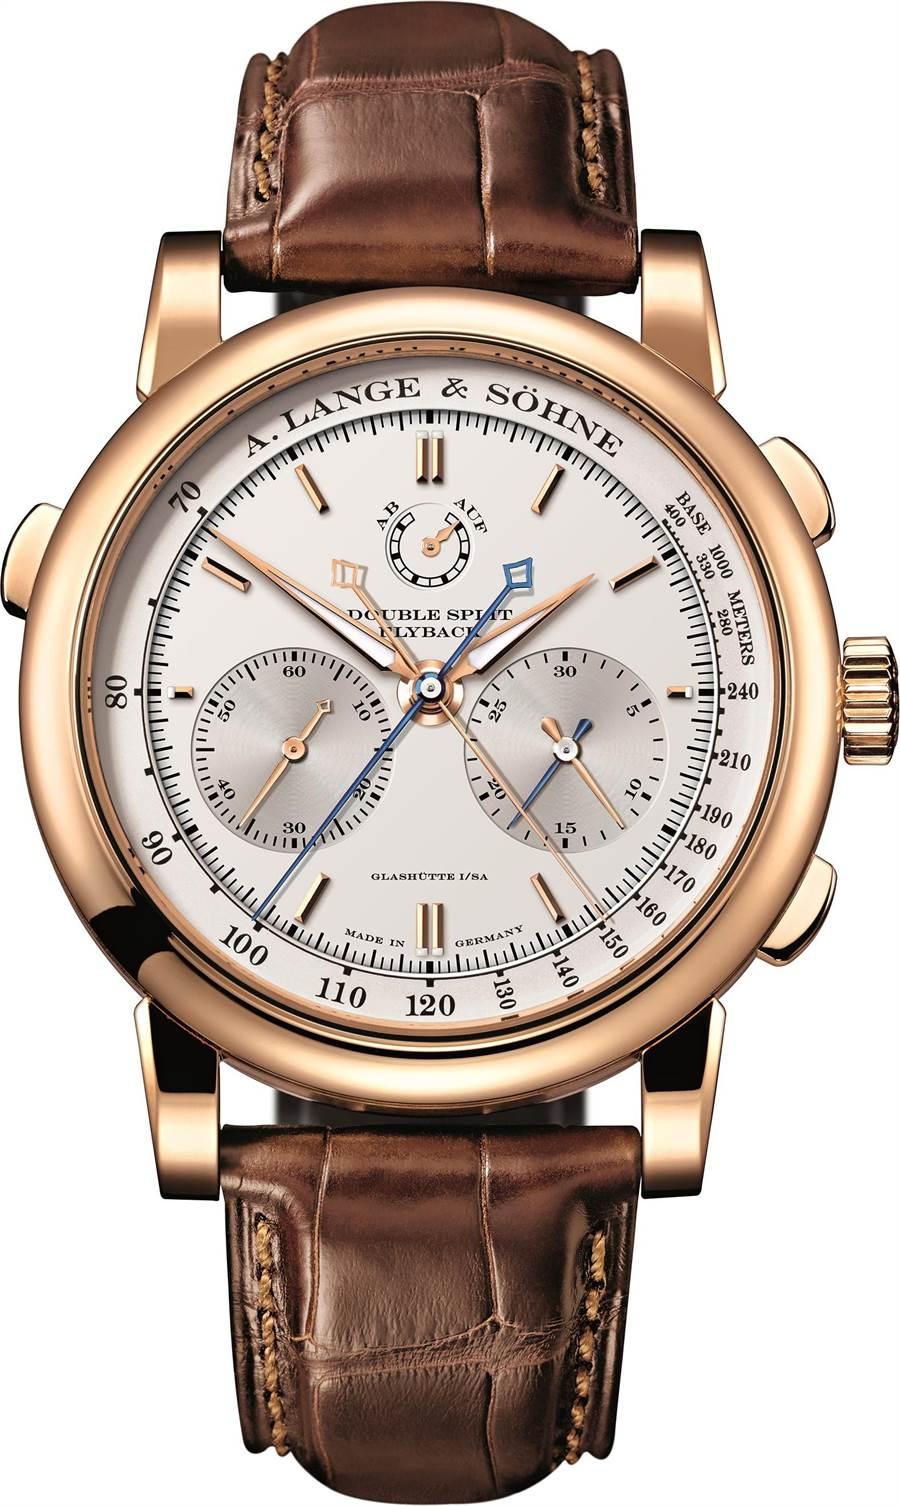 朗格Double Split雙追針腕表,394萬元。(A. Lange & Sohne提供)